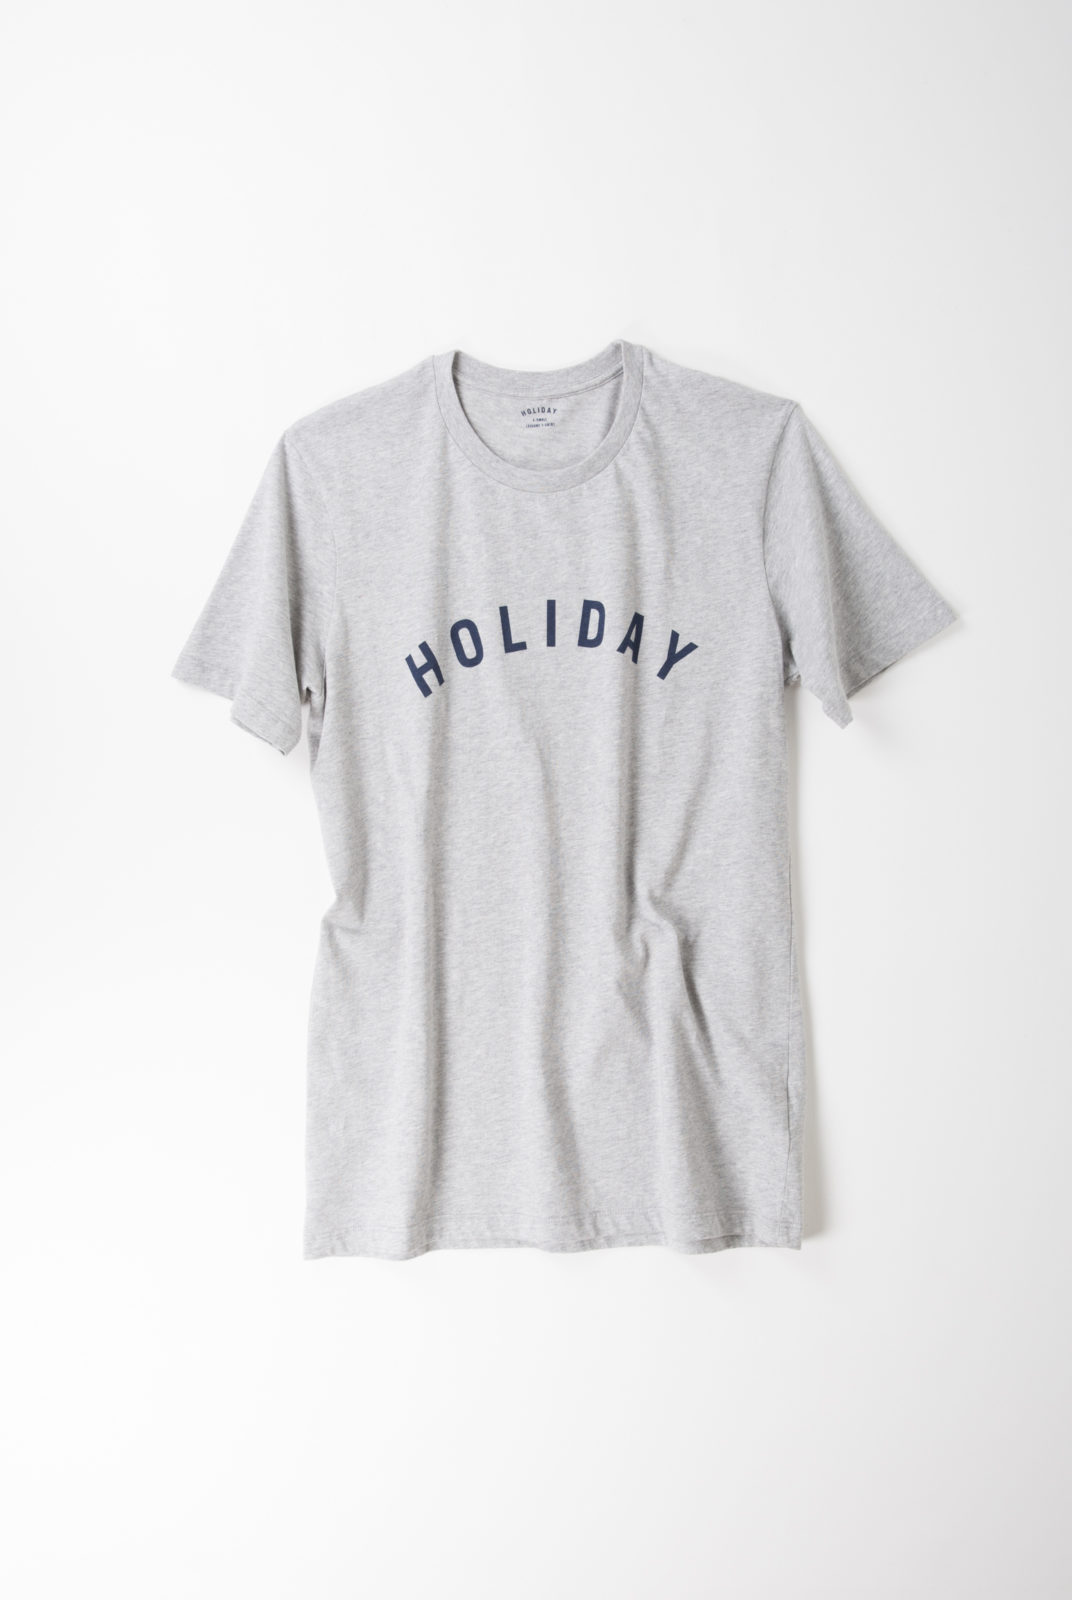 tshirt, gris chiné, coton, encolure ronde, manches courtes, holiday